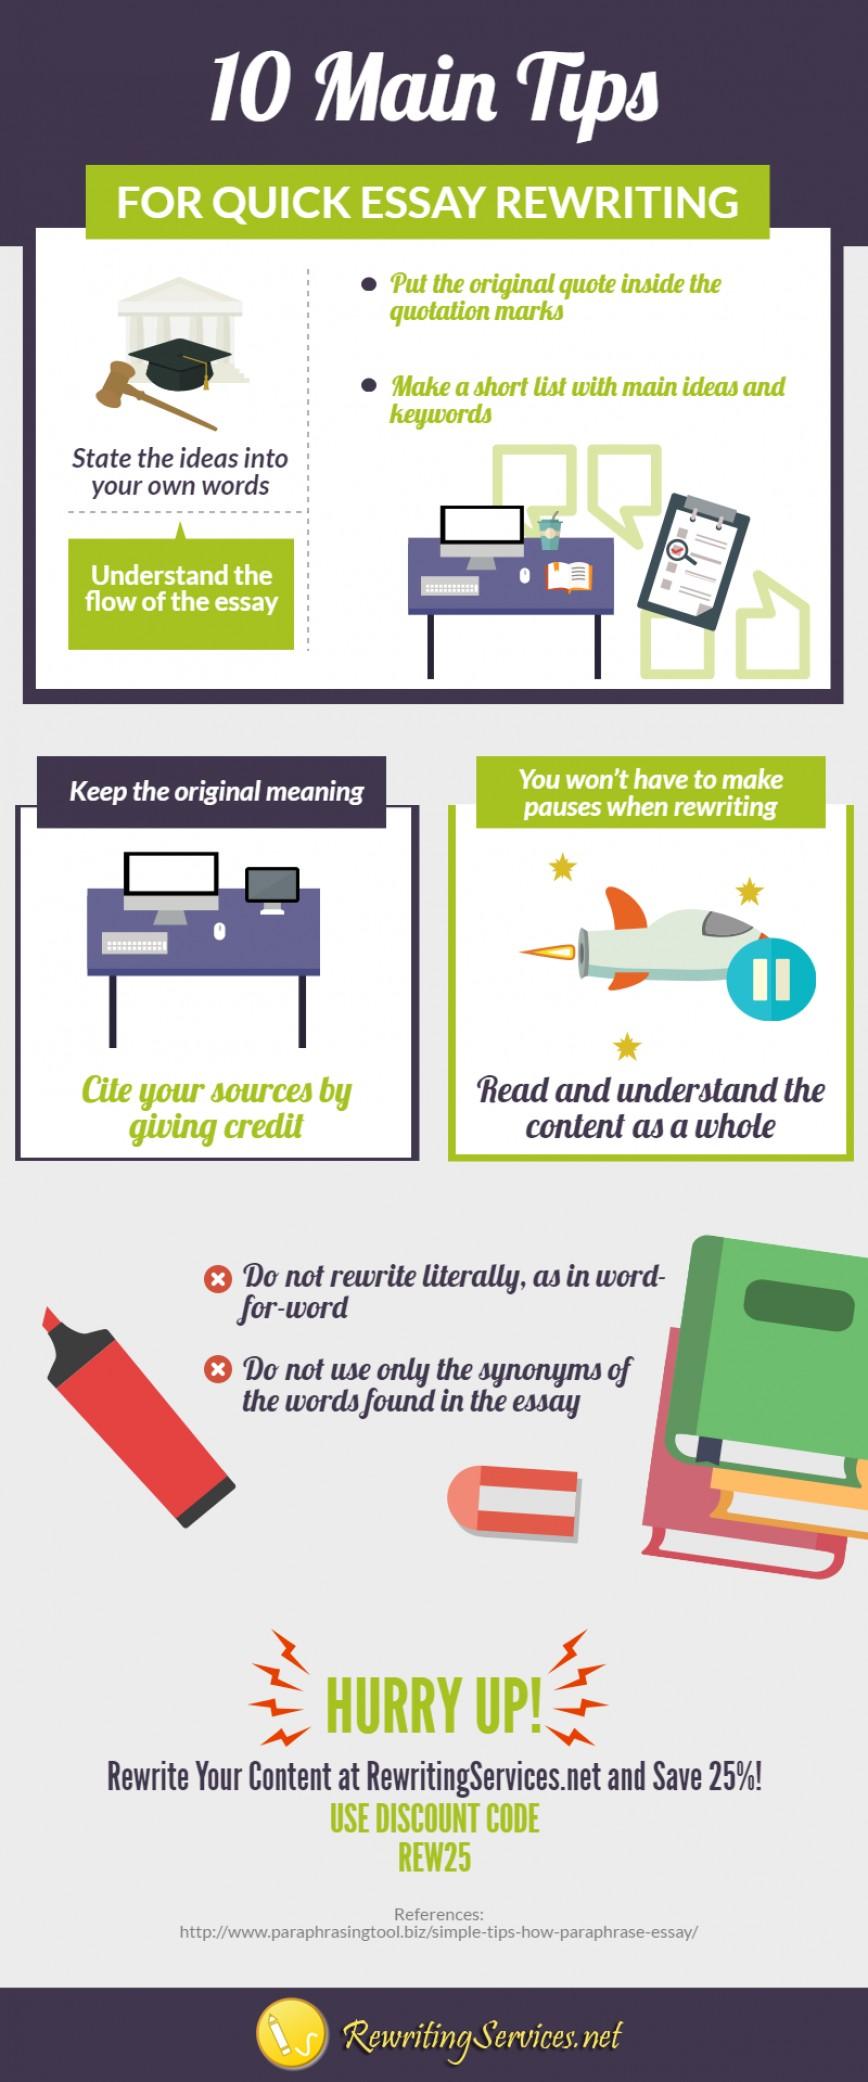 003 Essay Example Quick Rewriting Best Rewrite Essays Free Crossword Clue Online